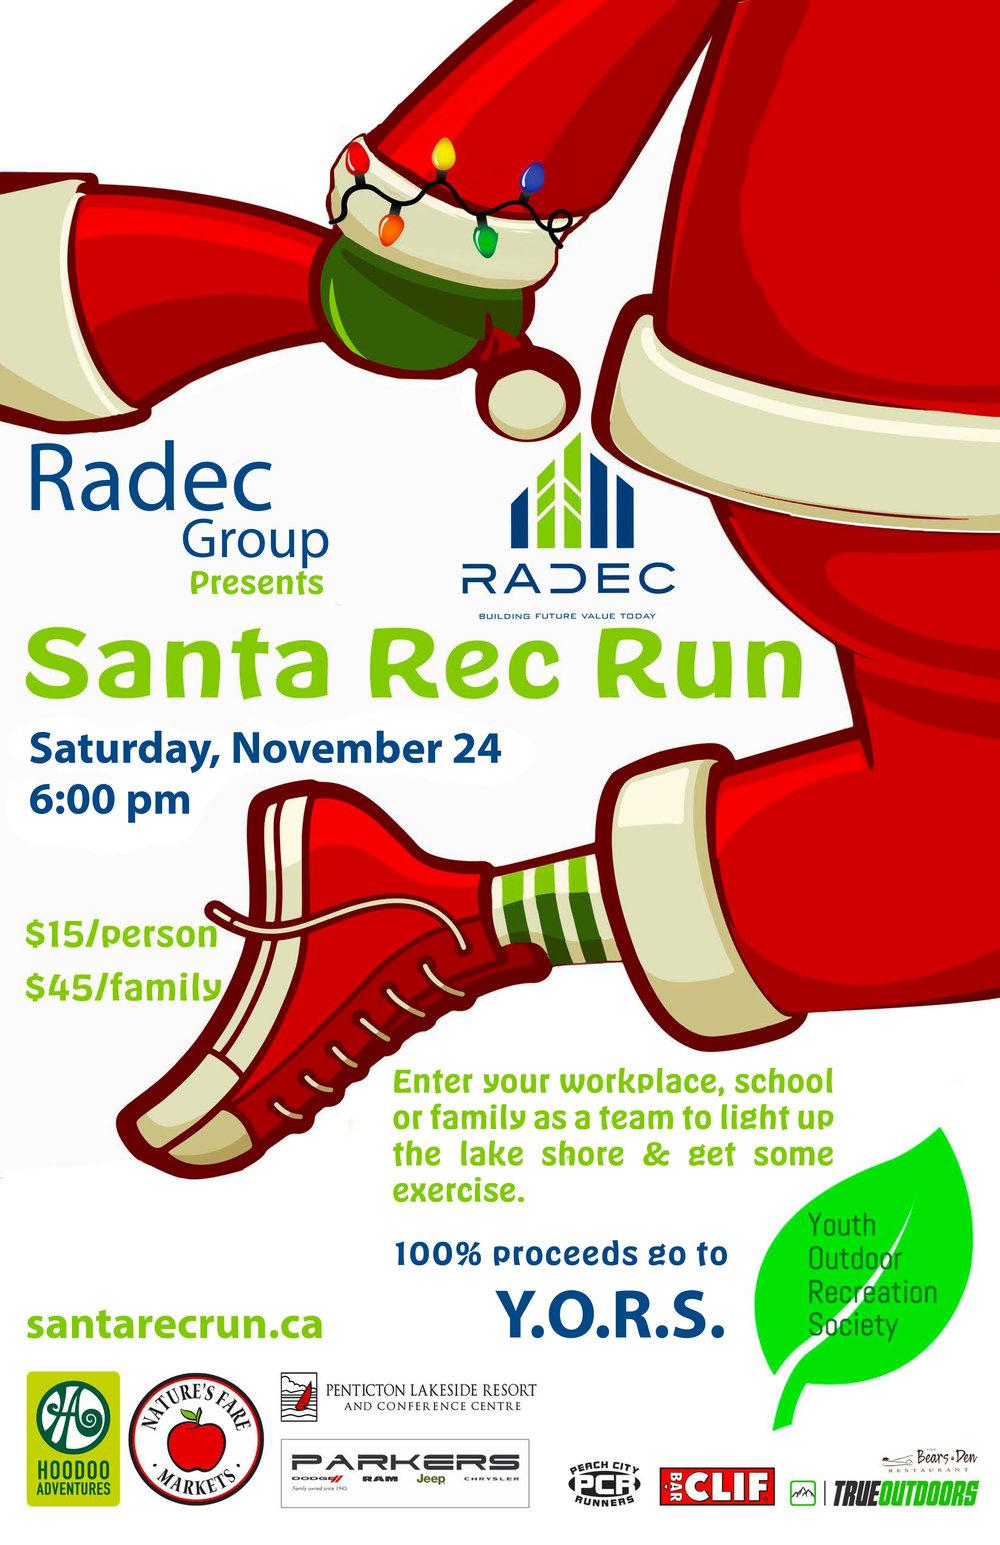 Santa Rec Run Poster 11x17 V1.2 vibrant.jpg